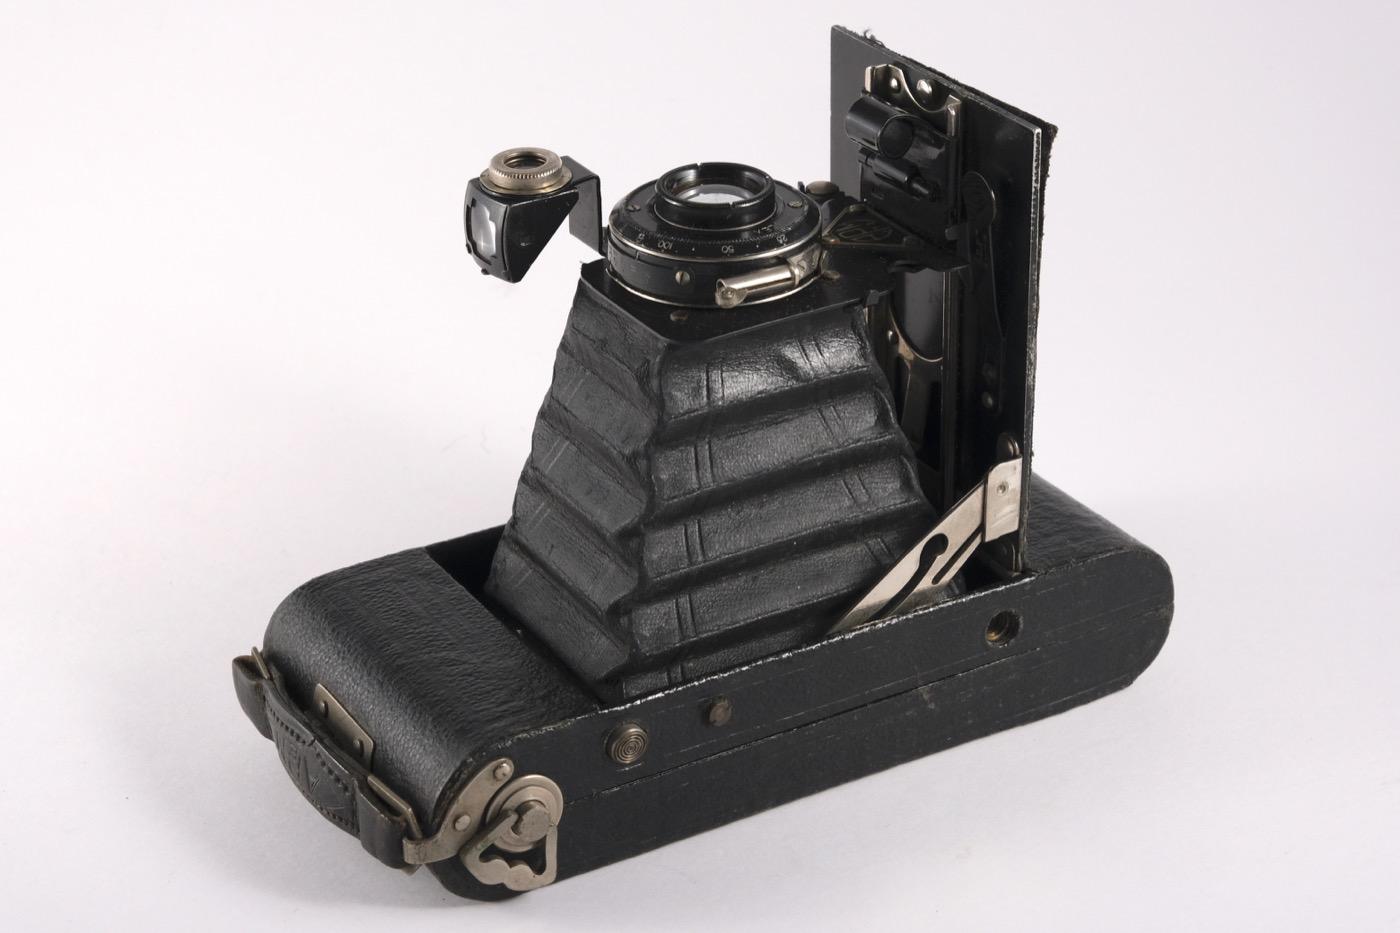 APM Ltd Ilex APEM camera